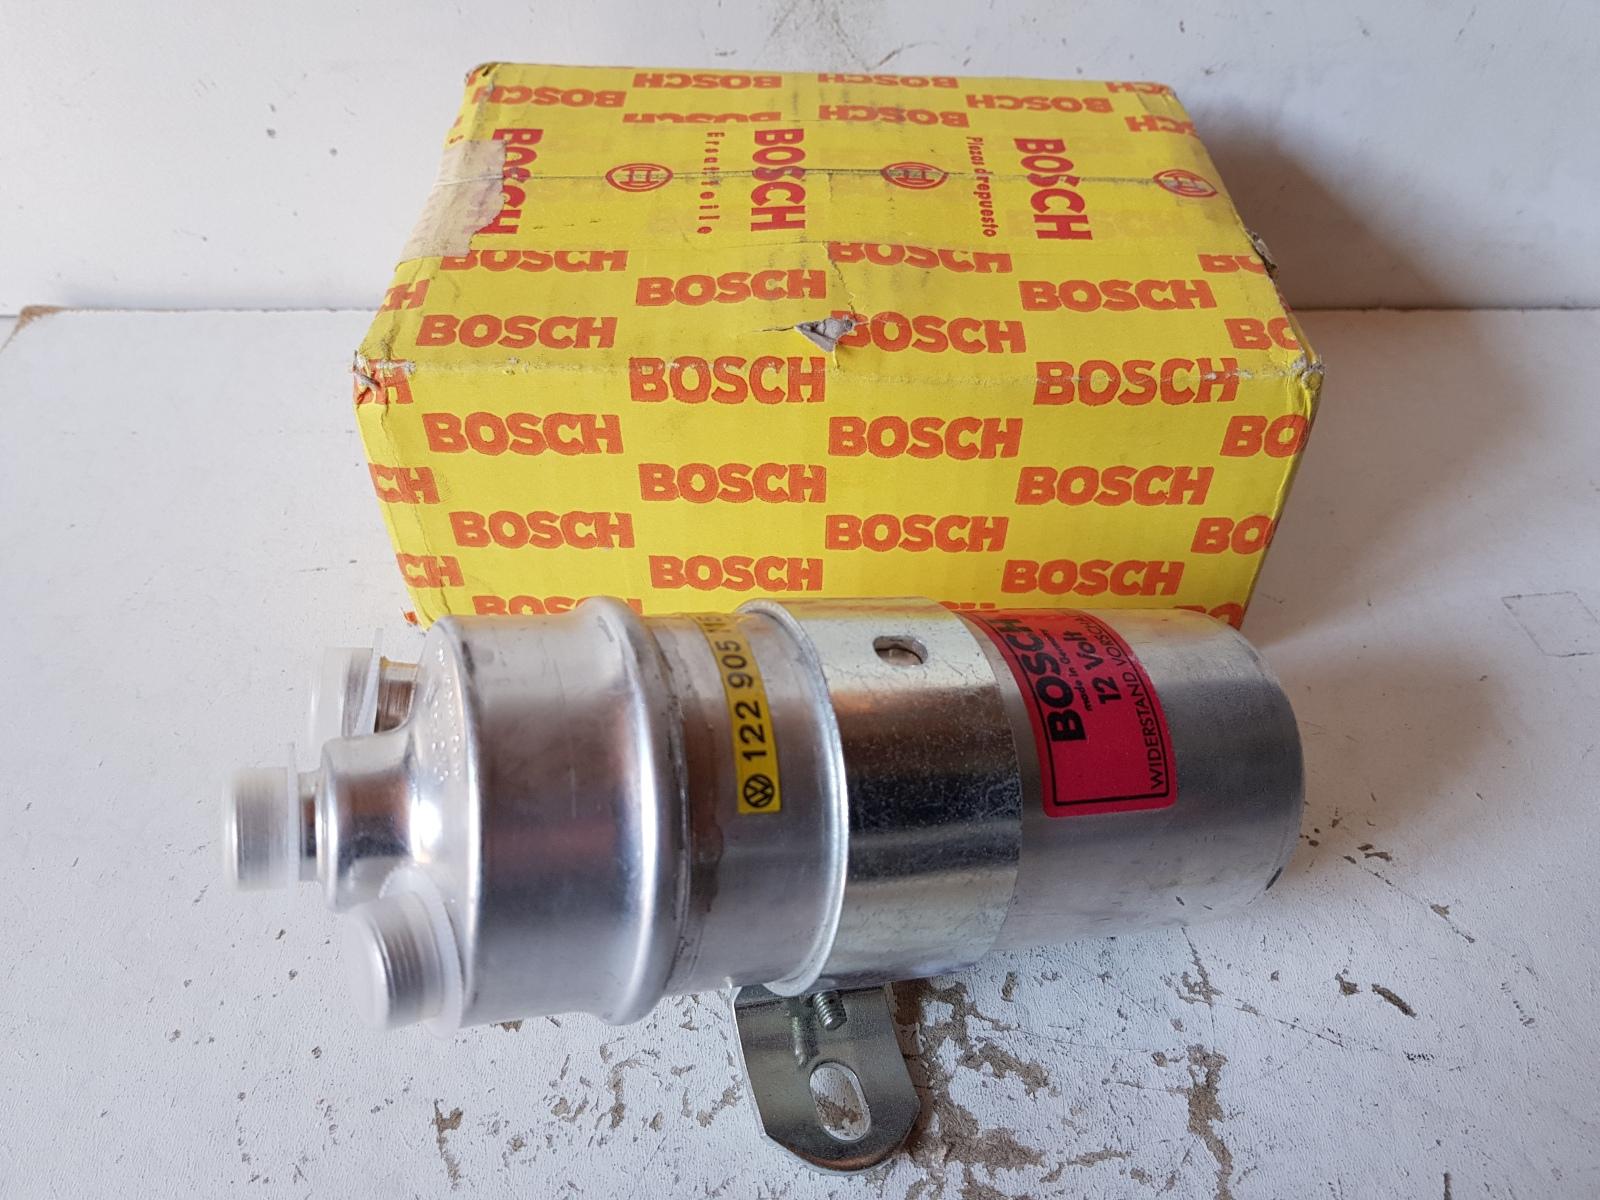 Bosch Zündspule 0221107001 VW 122905115D 12V Bobine Transformer Coil